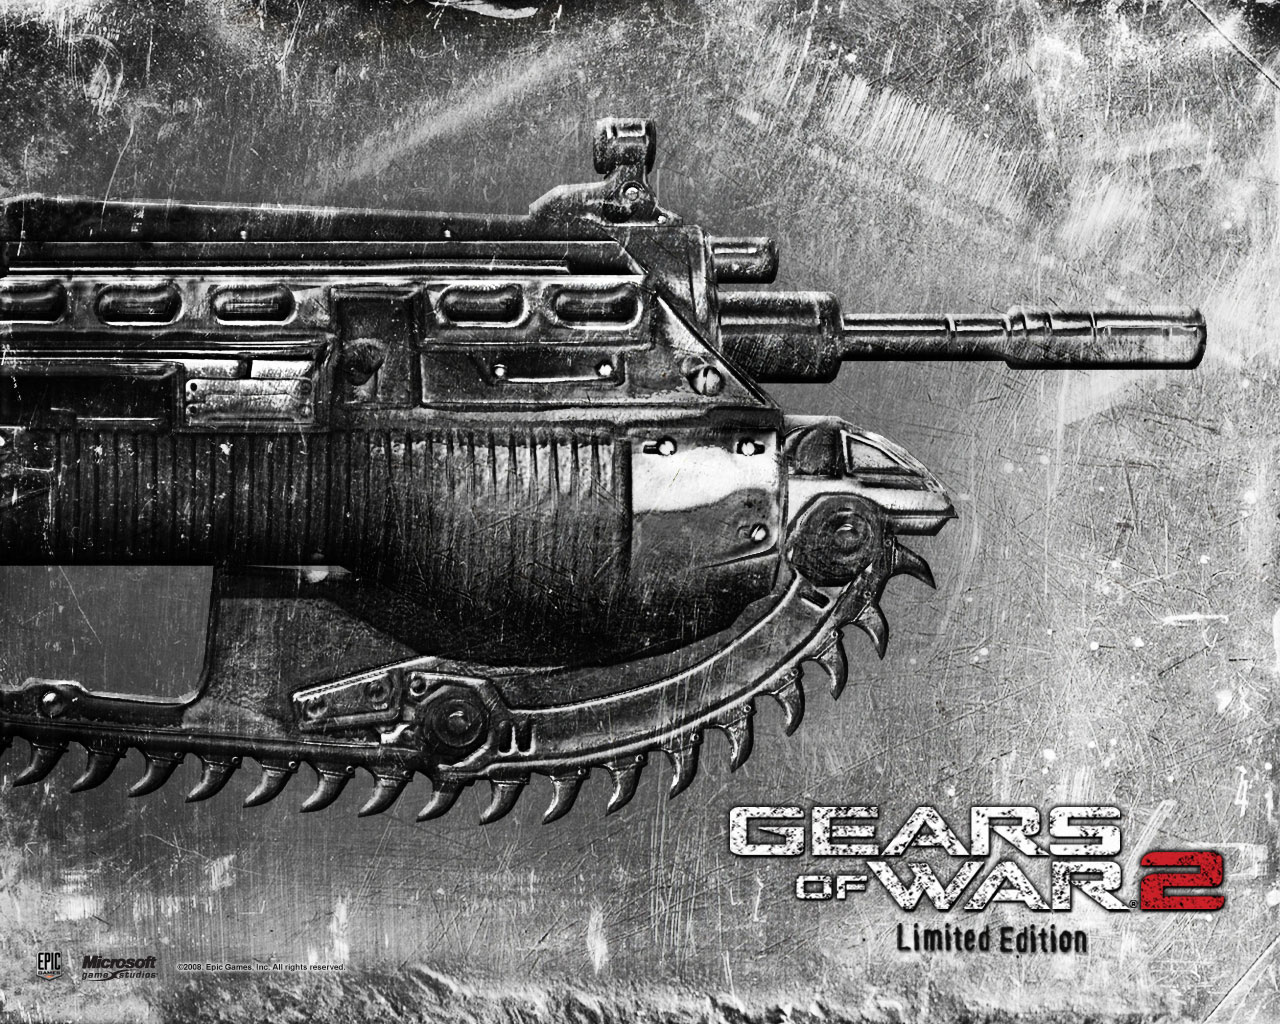 http://1.bp.blogspot.com/-ozH8TkbkAaQ/ULaOcIqpo3I/AAAAAAAAADA/D5iJZ7faO_U/s1600/gears_of_war_2_wallpaper7_mooki%5B1%5D.jpg